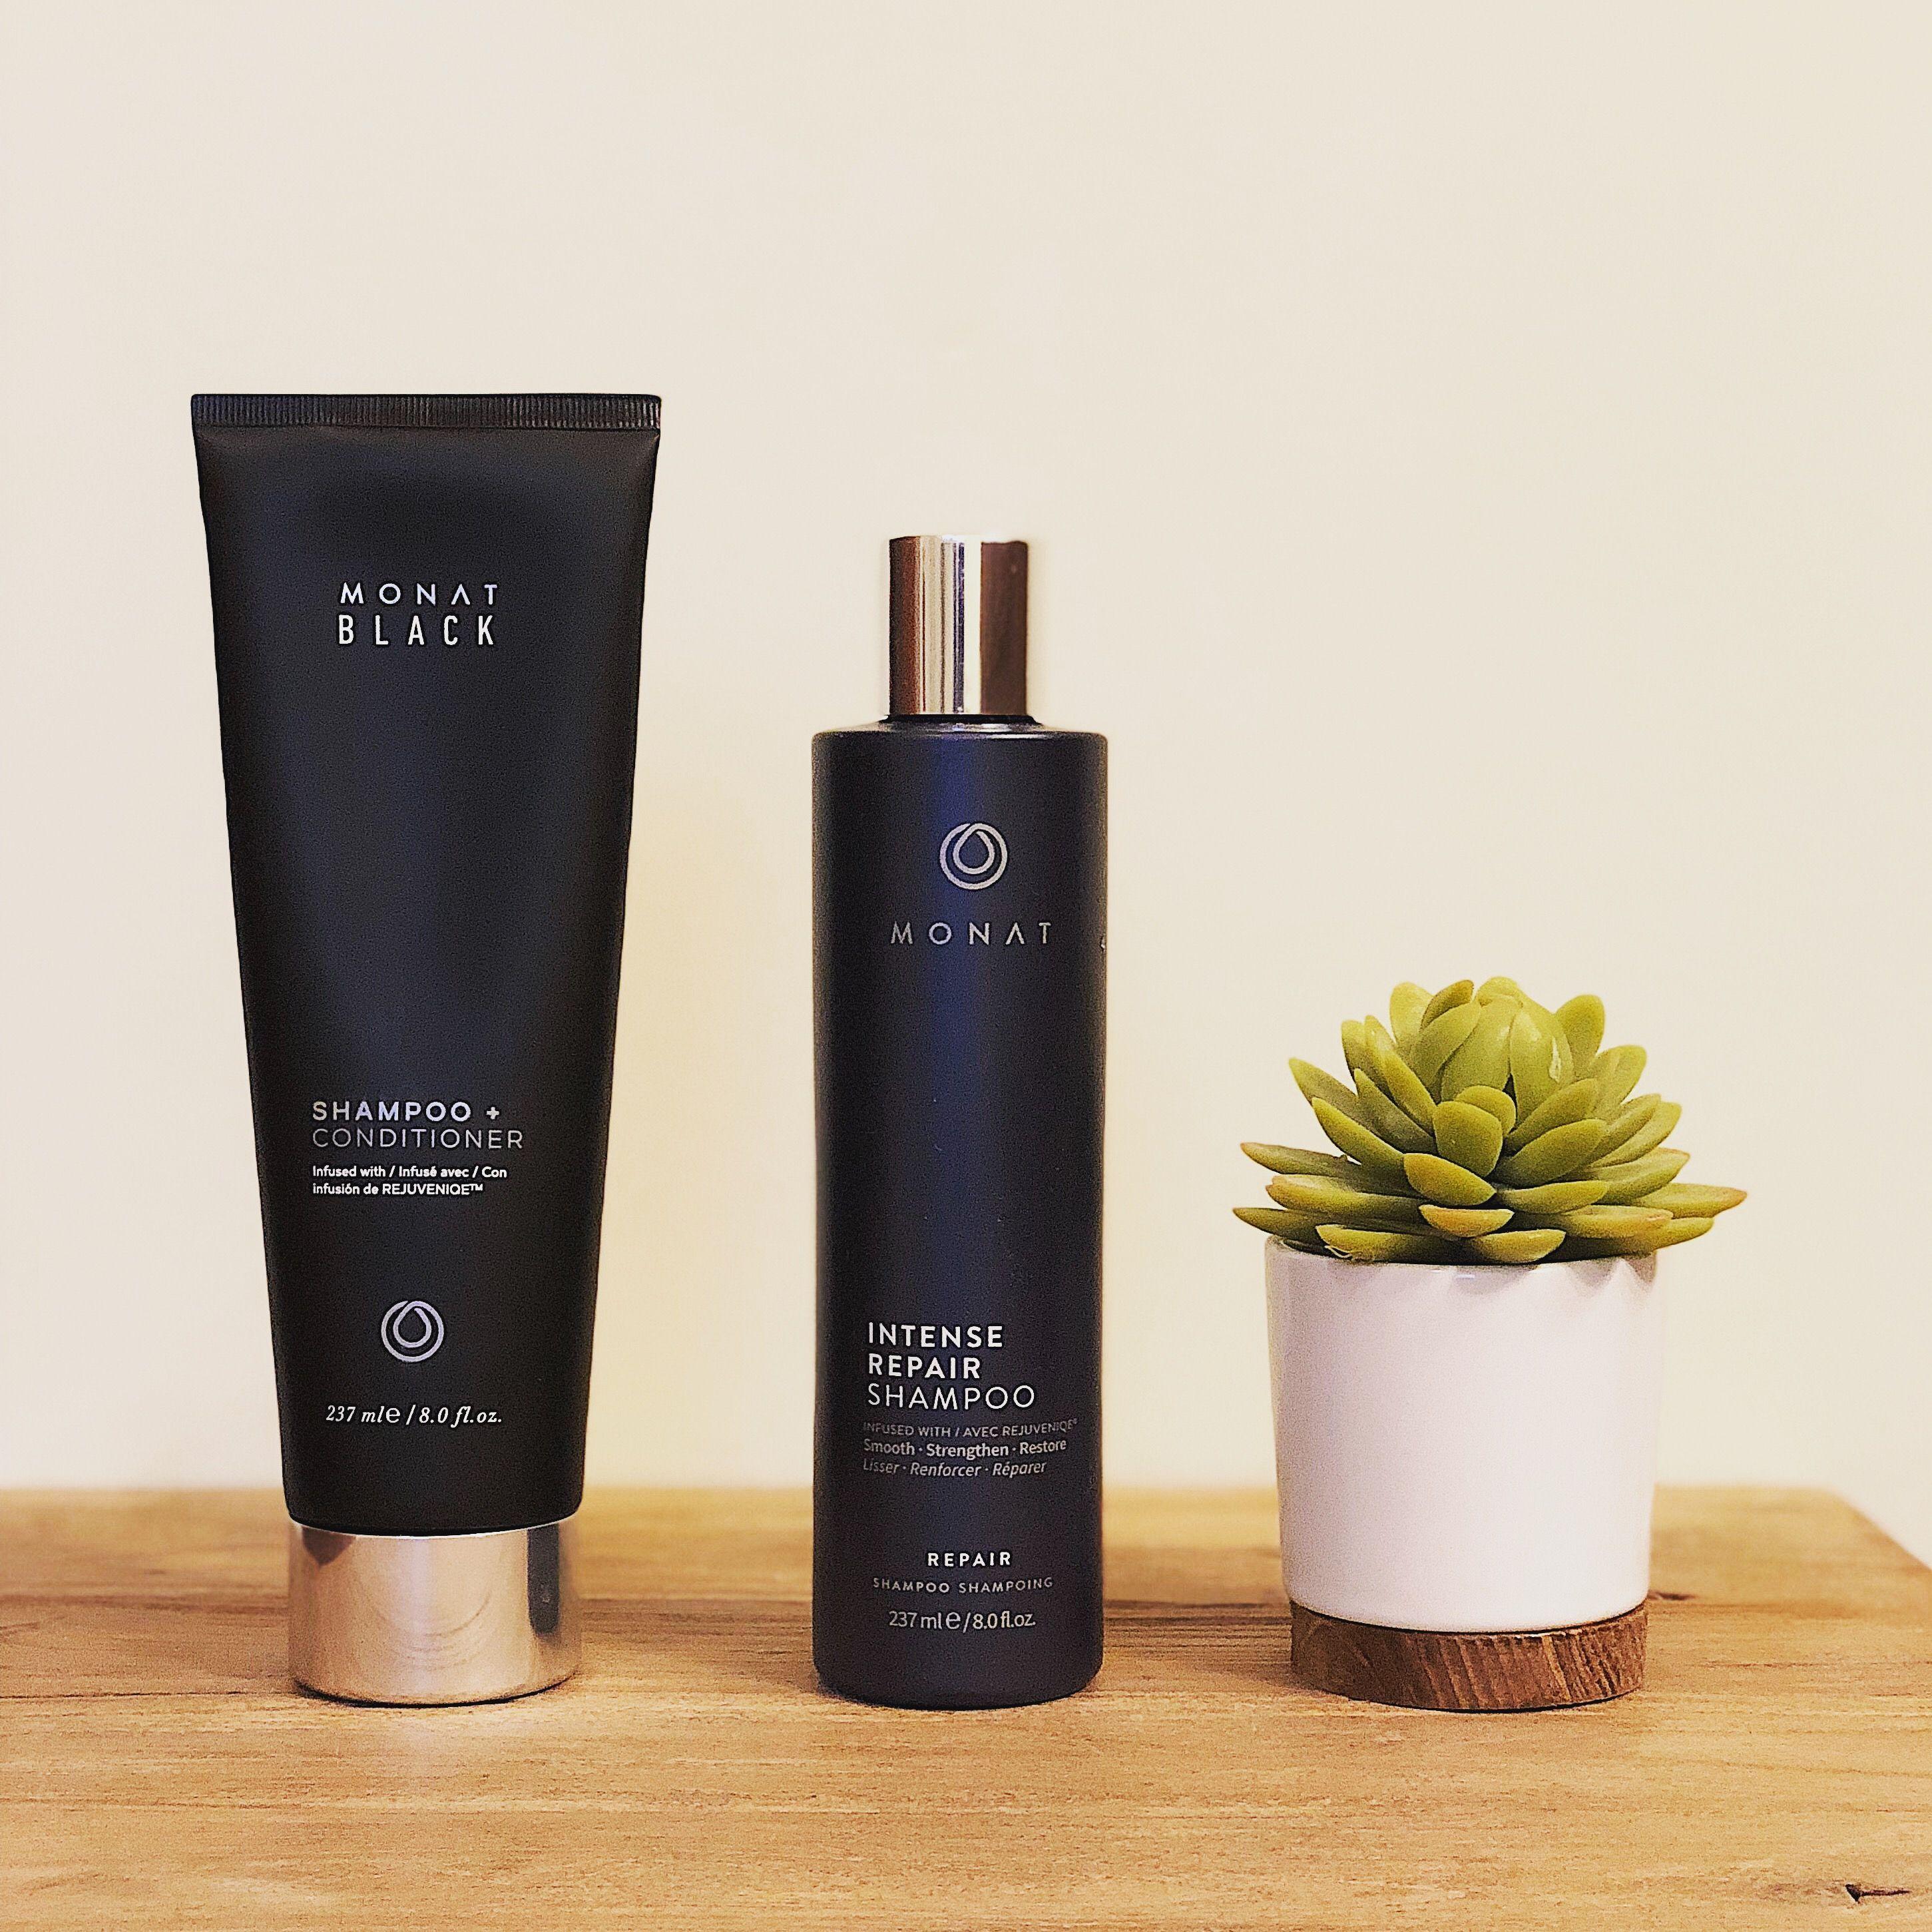 Monat Shampoo And Conditioner